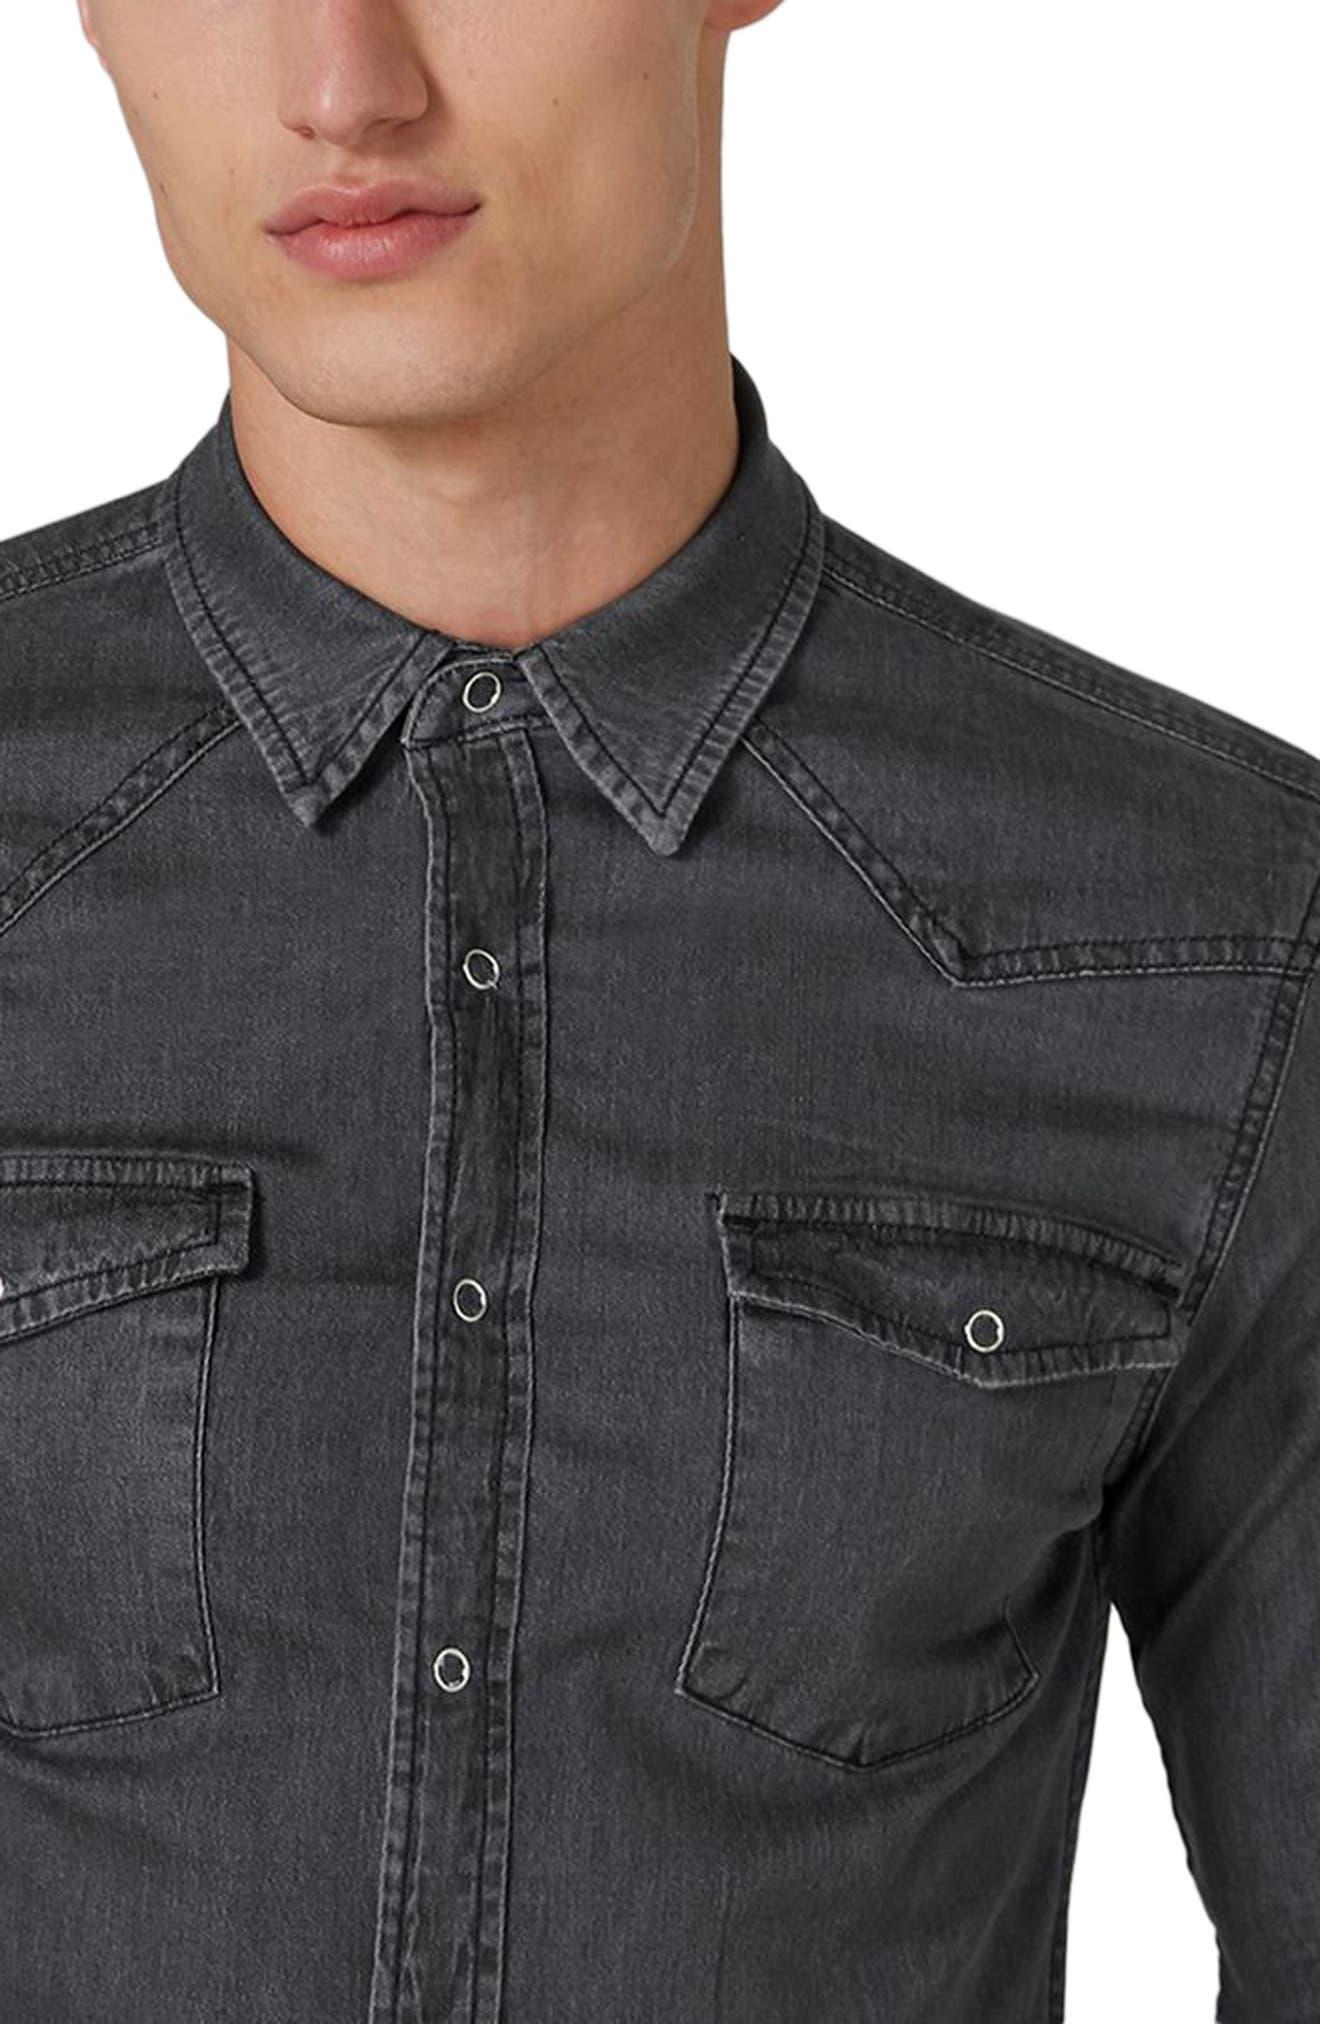 TOPMAN,                             Muscle Fit Denim Western Shirt,                             Alternate thumbnail 3, color,                             010